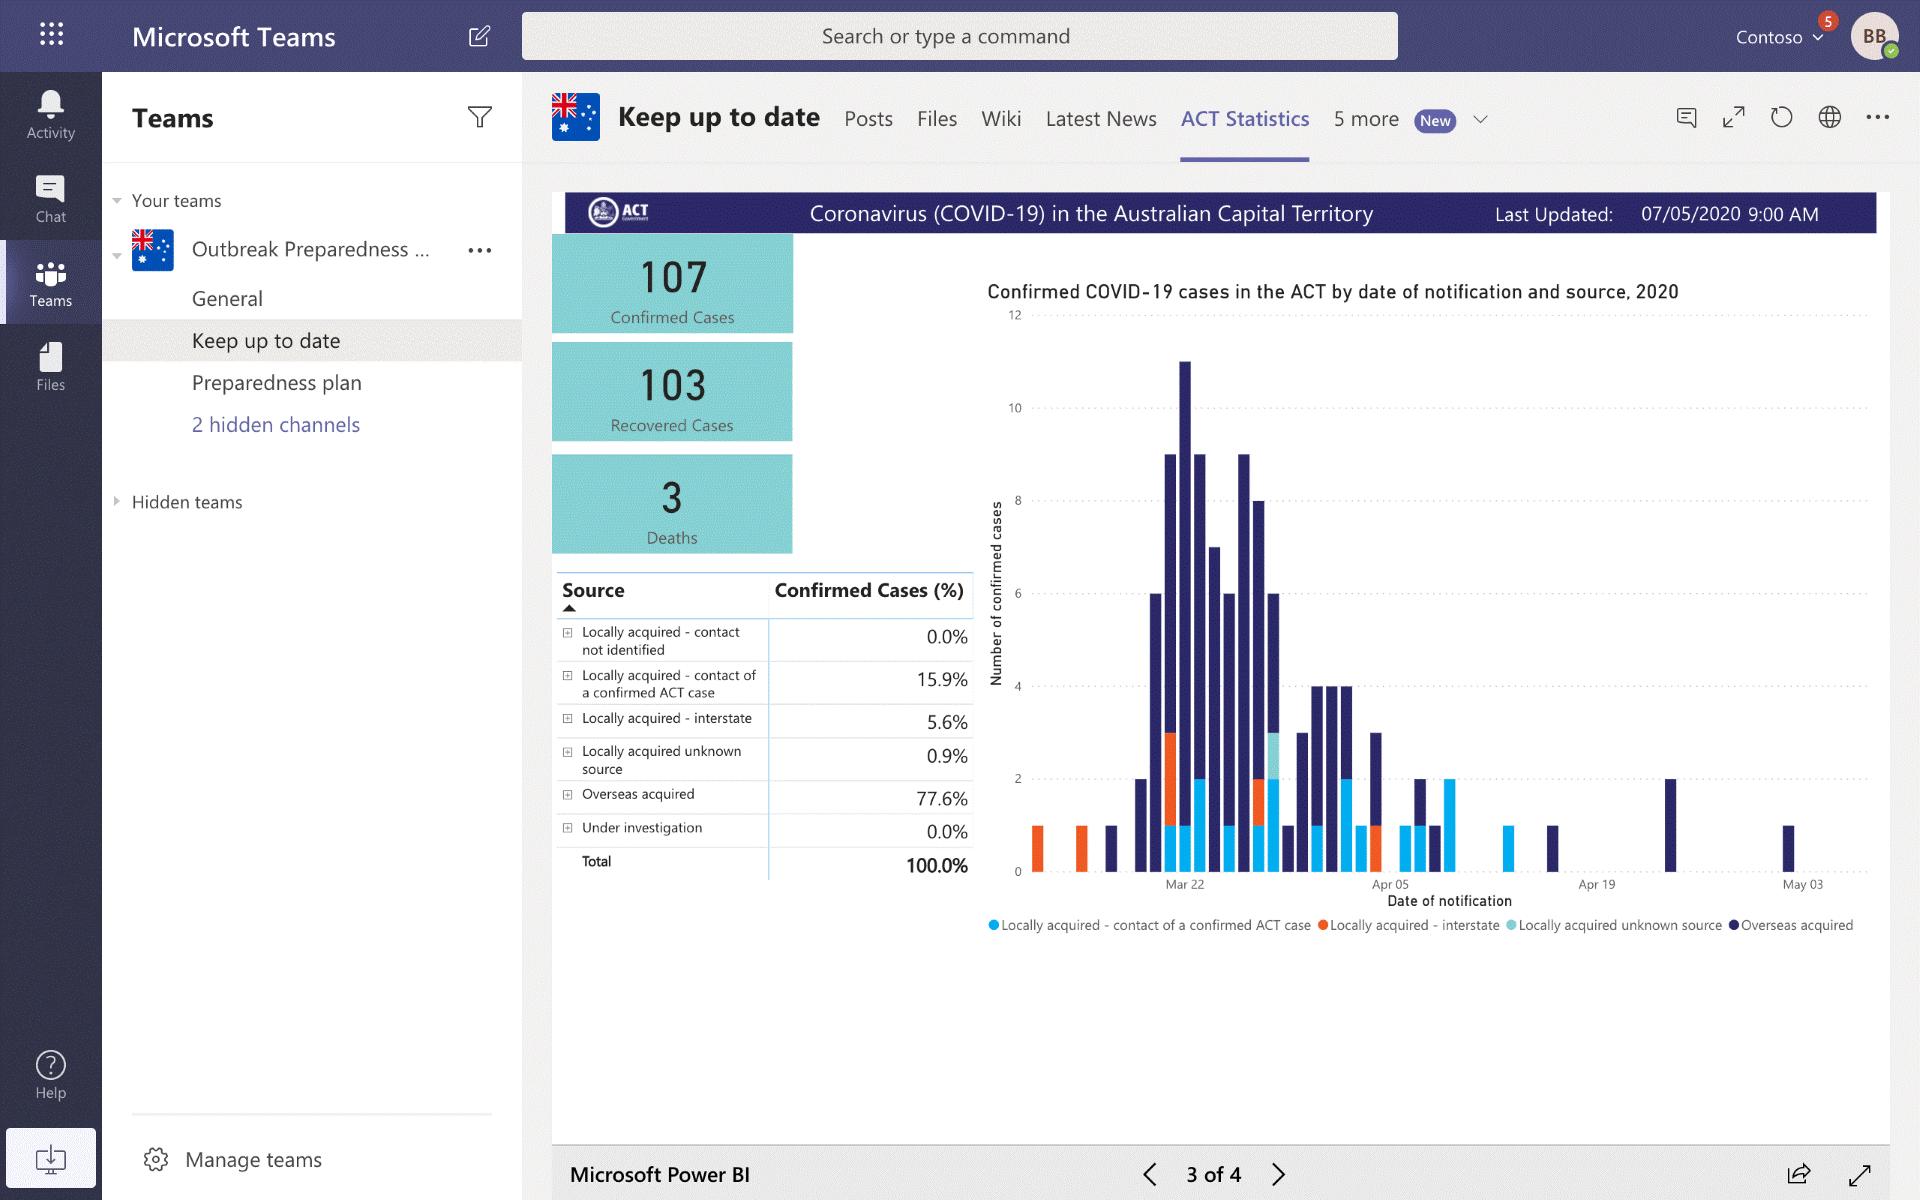 ACT Statistics